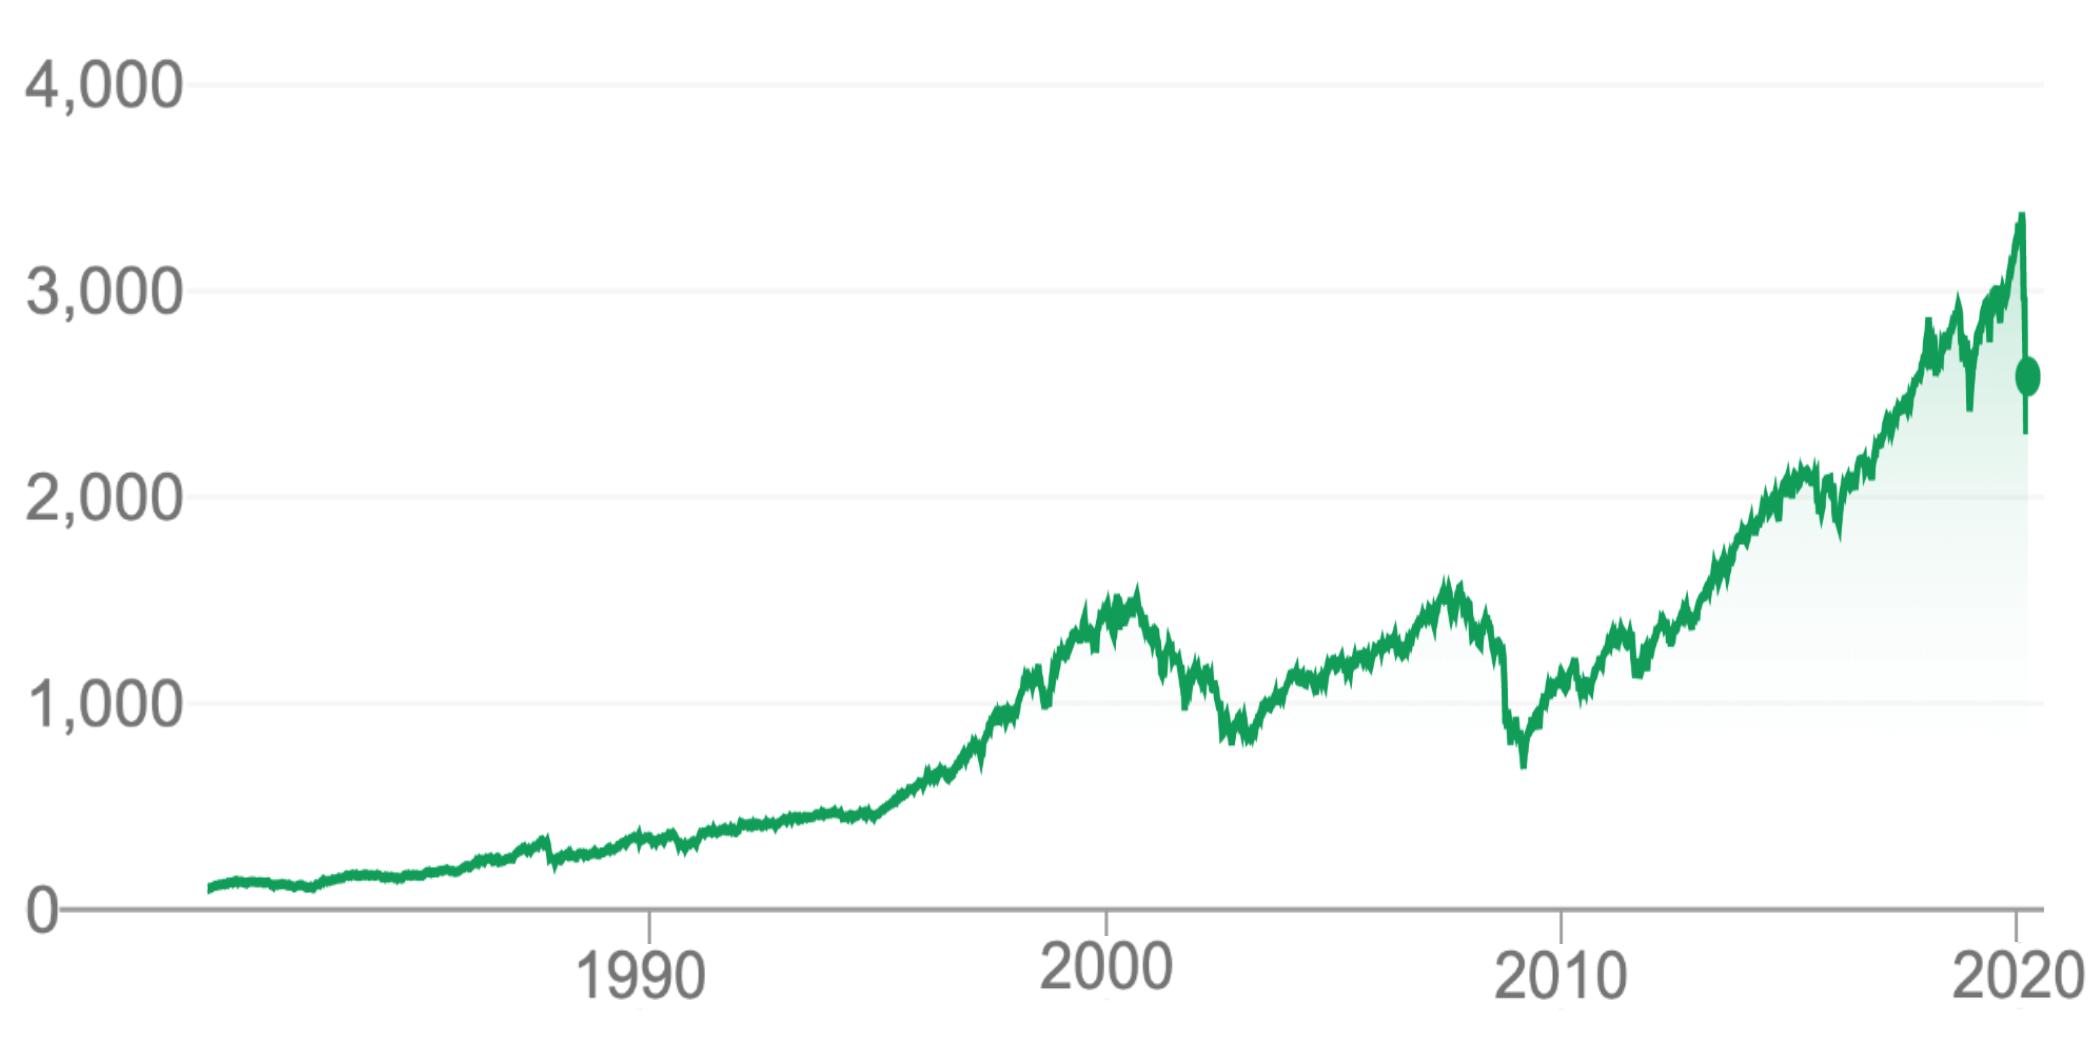 S&P 500 1980 - 2020